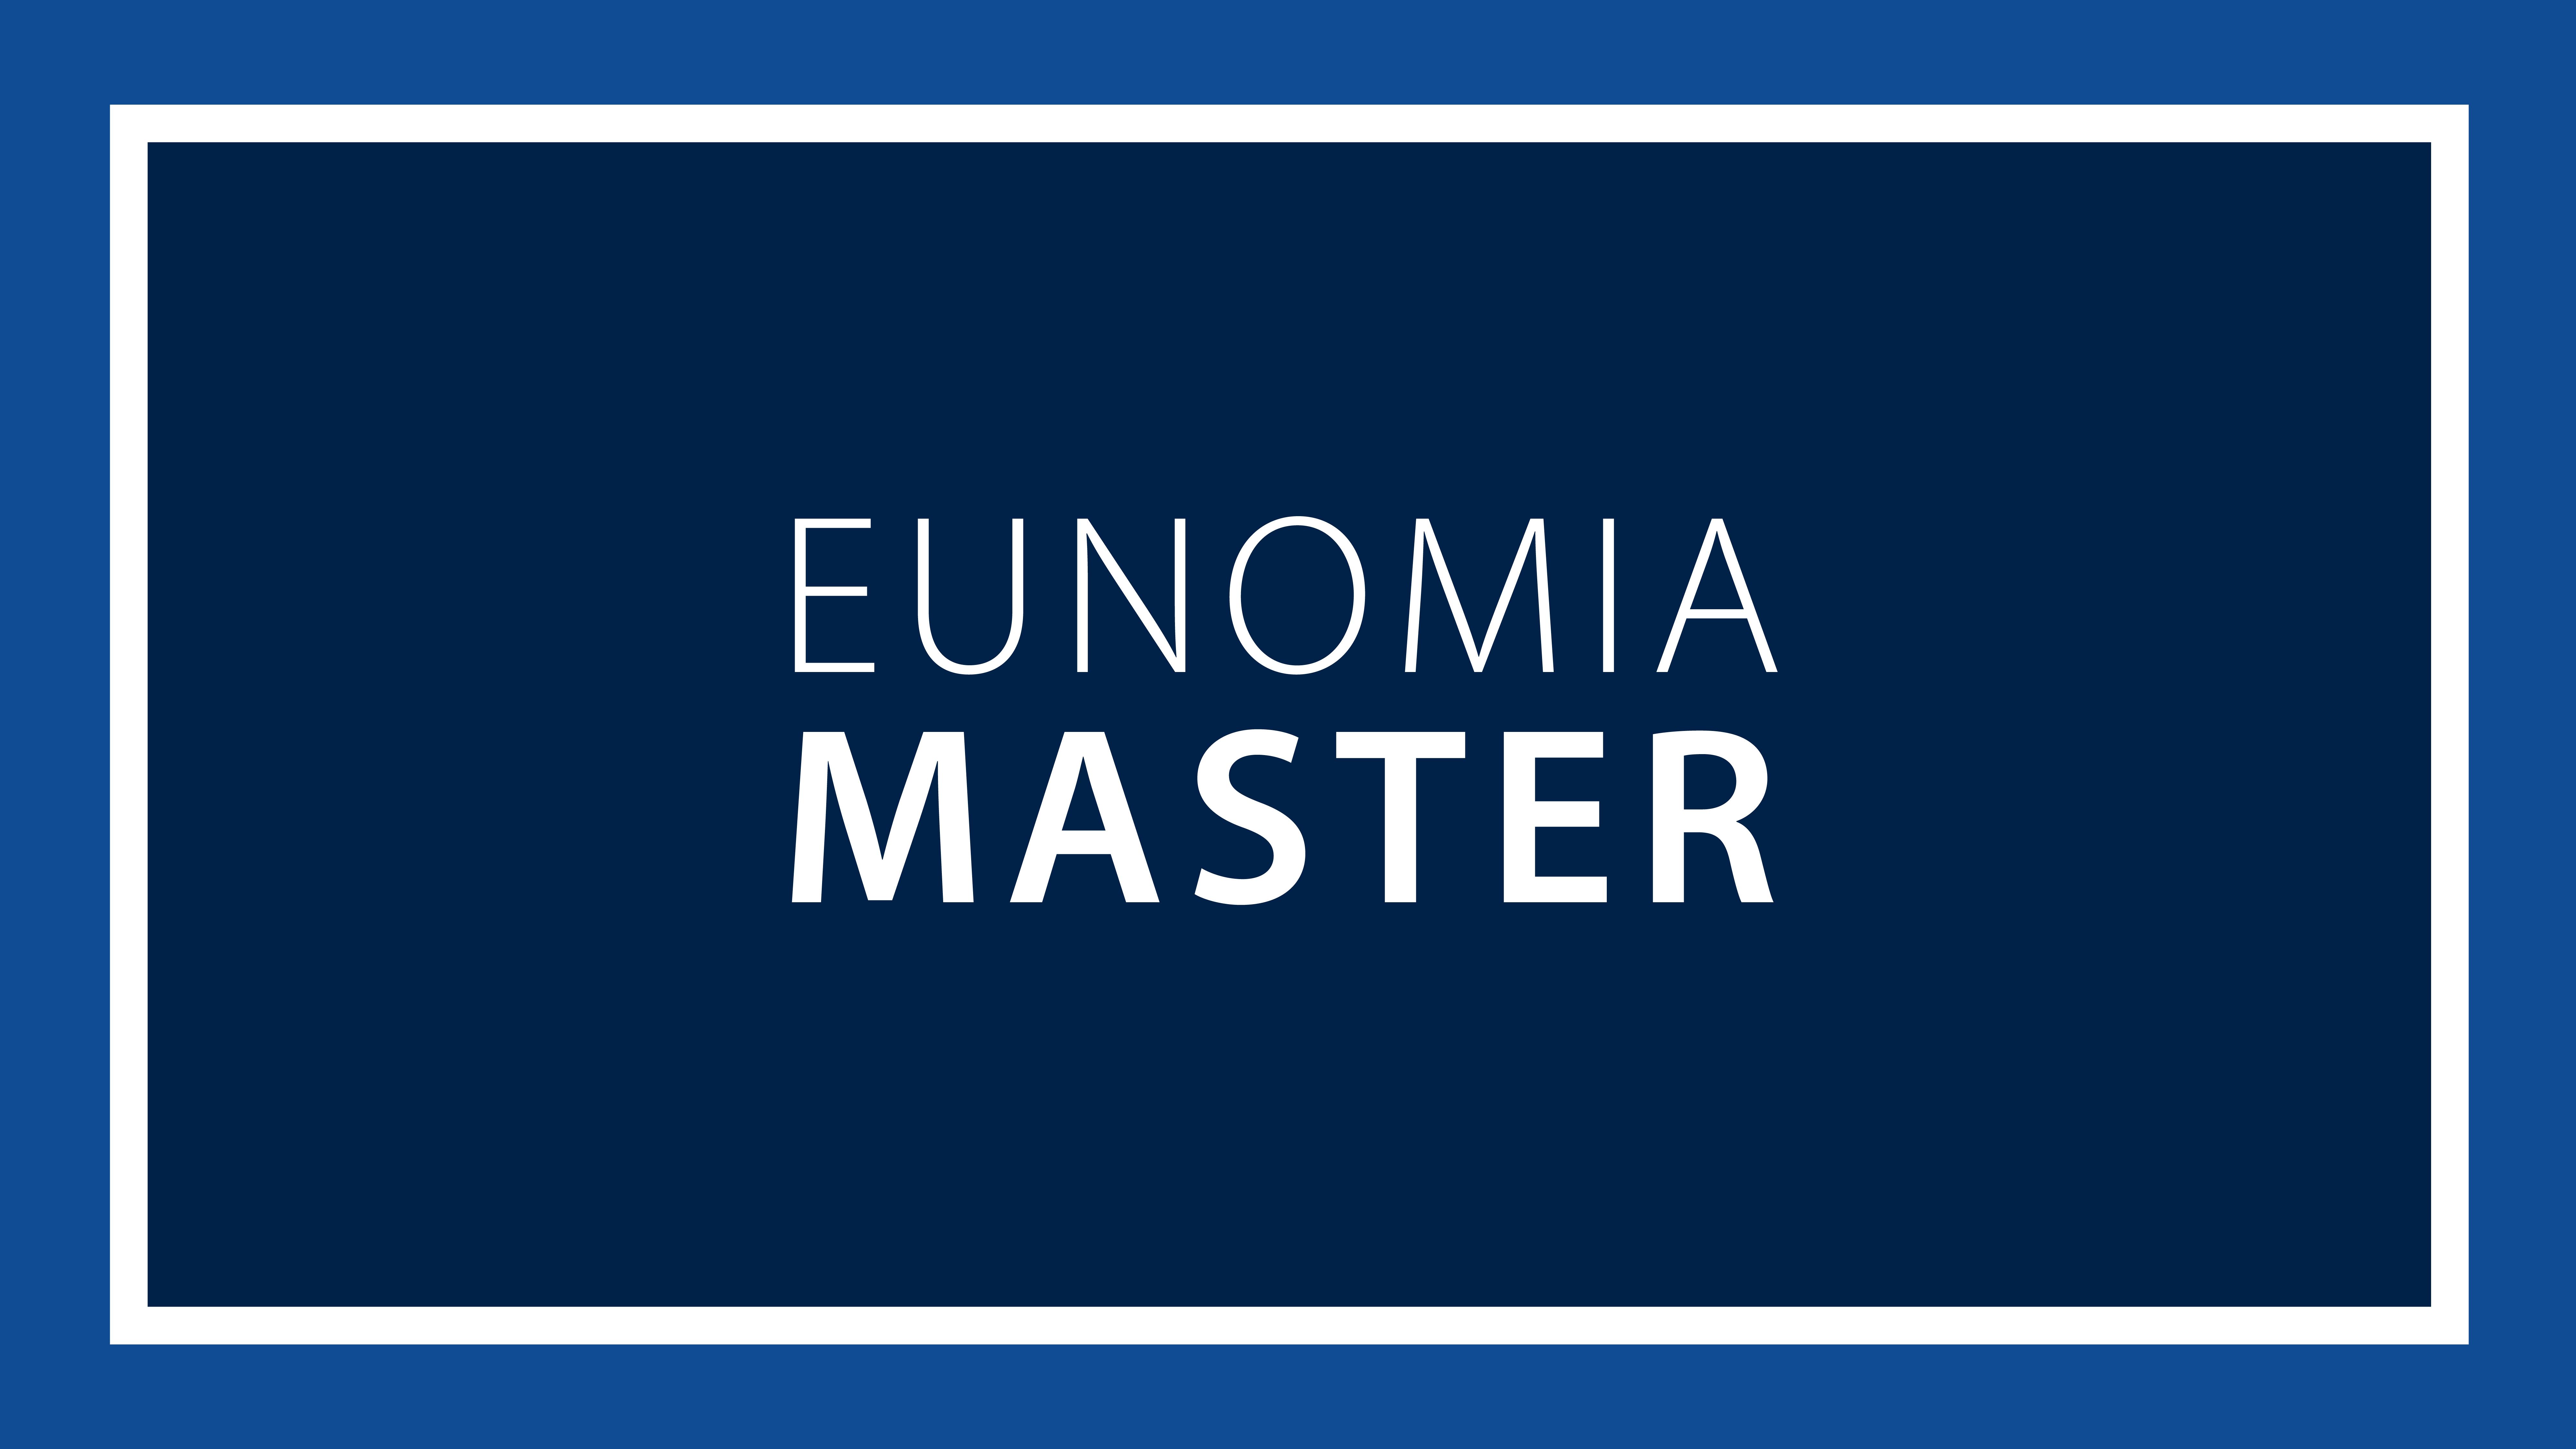 eunomia-master